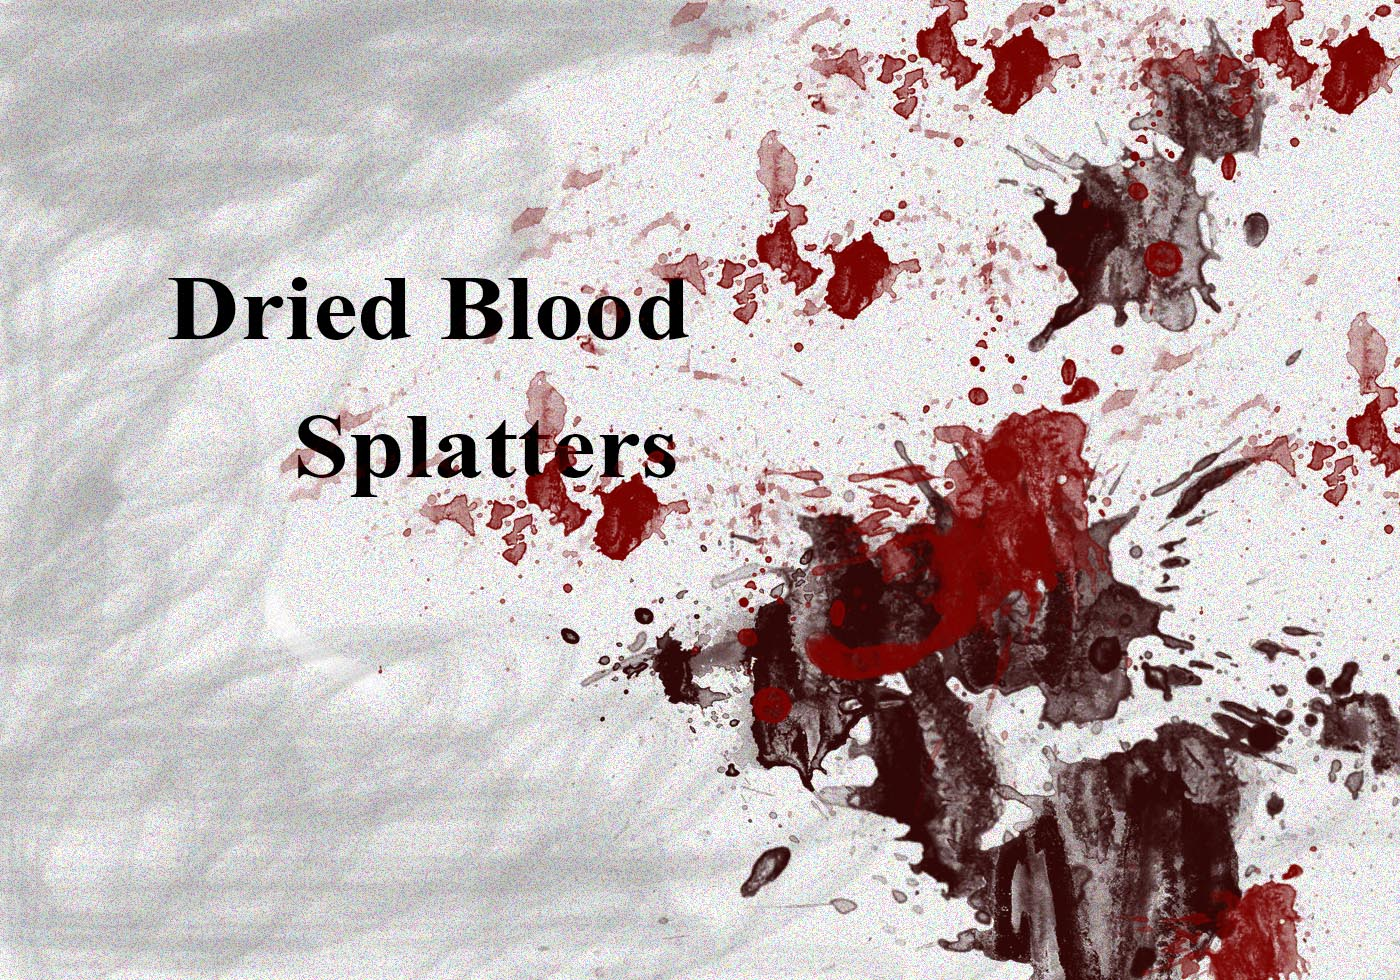 Dried Blood Splatters - Free Photoshop Brushes at Brusheezy!